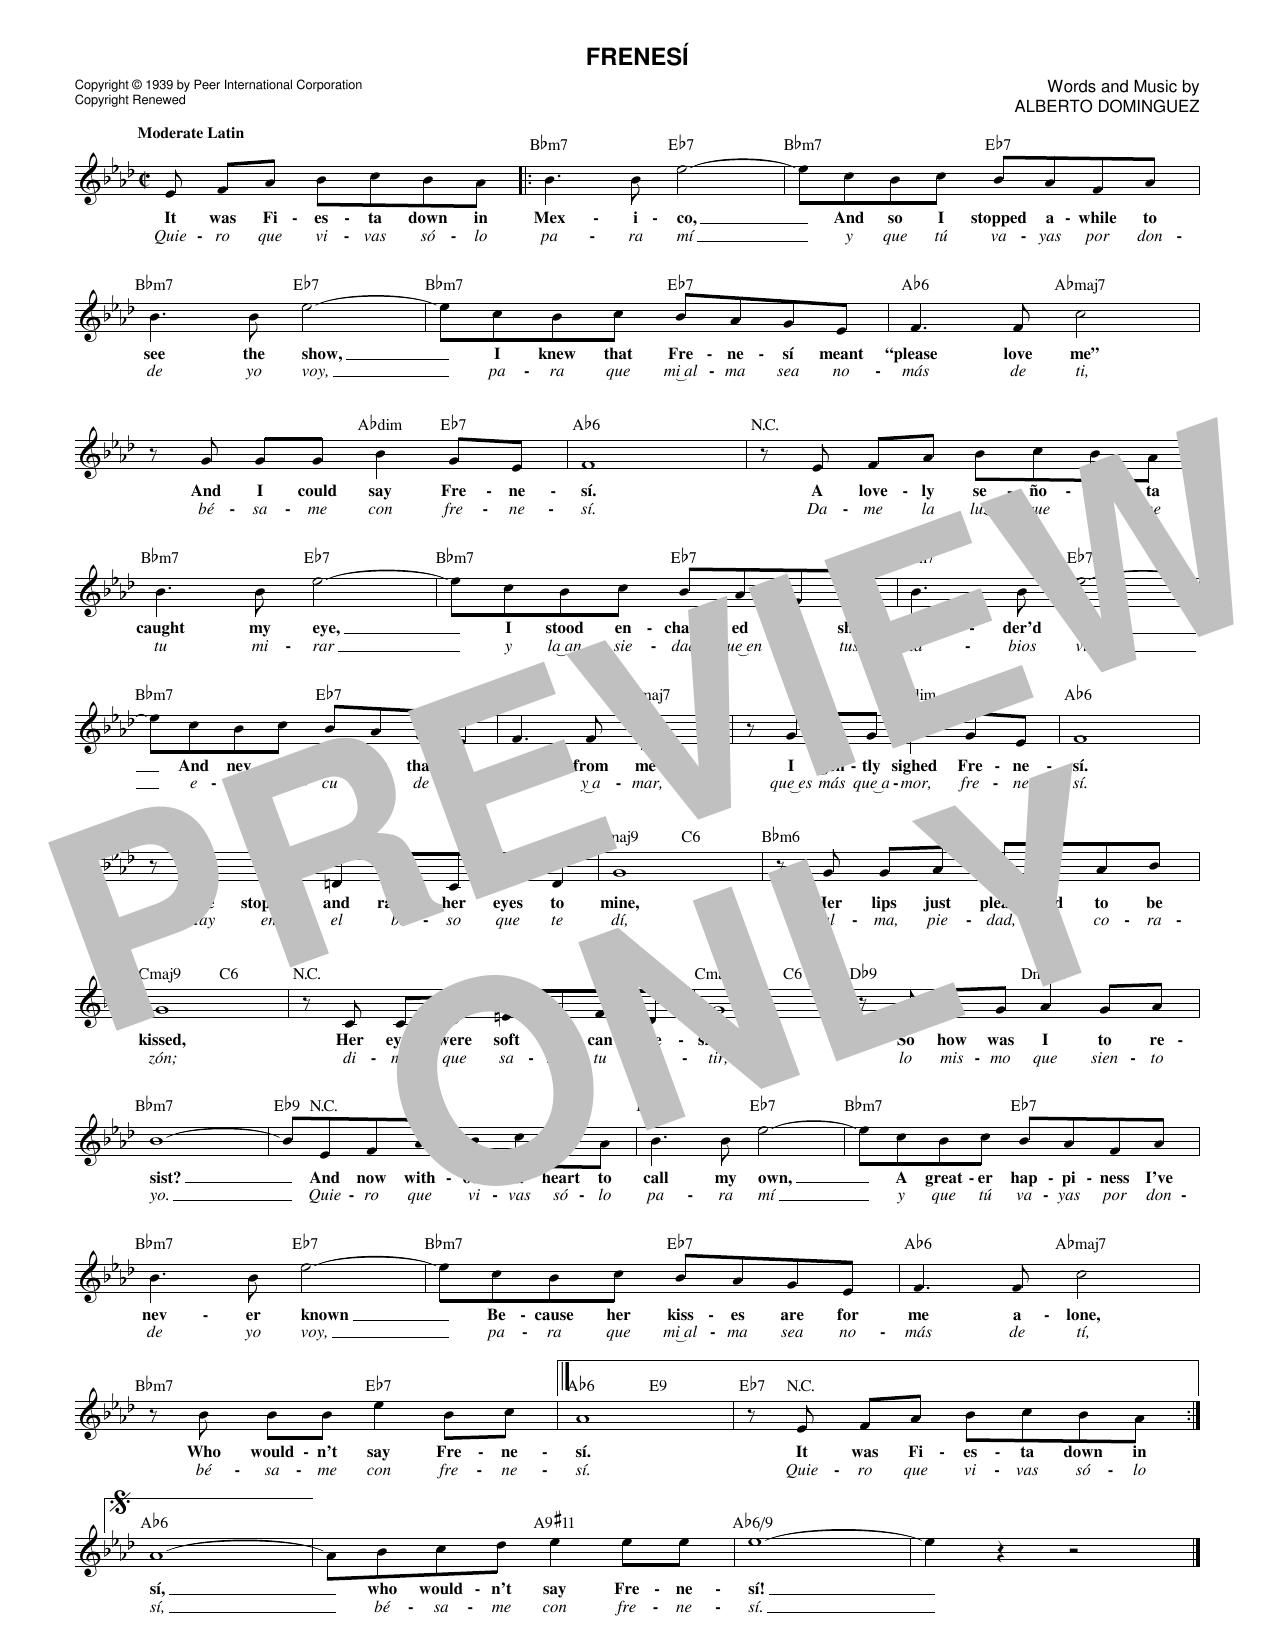 Sheet Music Digital Files To Print Licensed Alberto Dominguez